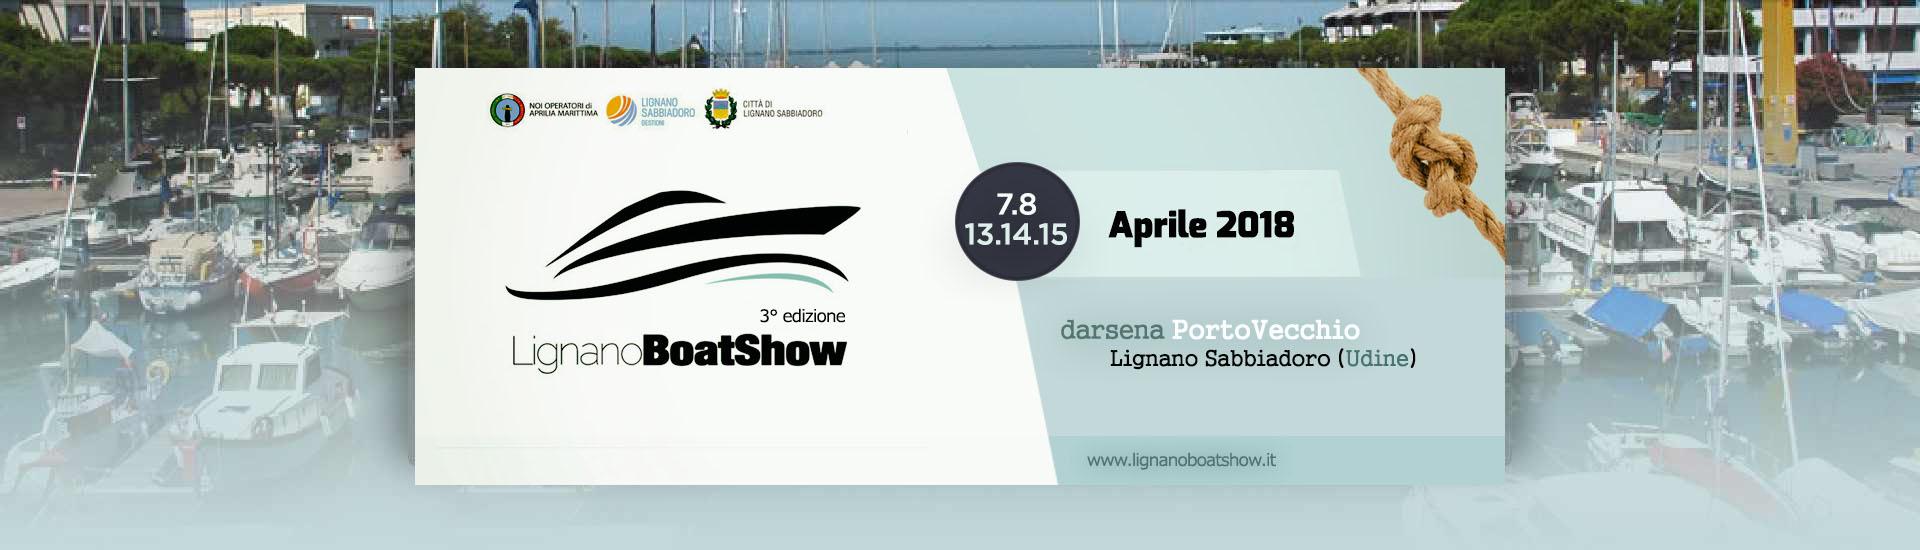 Lignano Boat Show 2018 Wave Marine